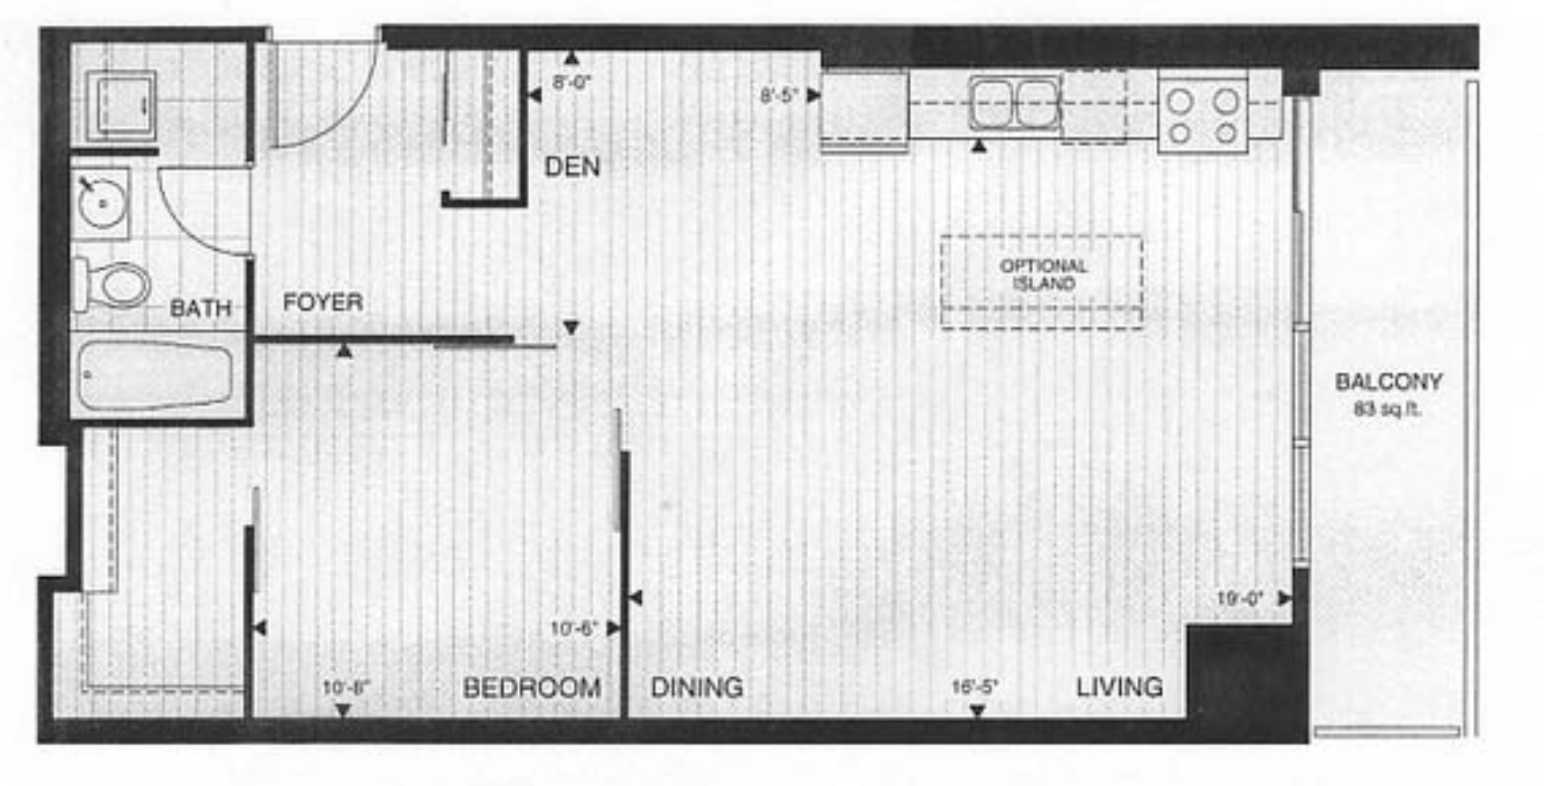 205 Frederick Street 1009 - Floor Plan Image.png